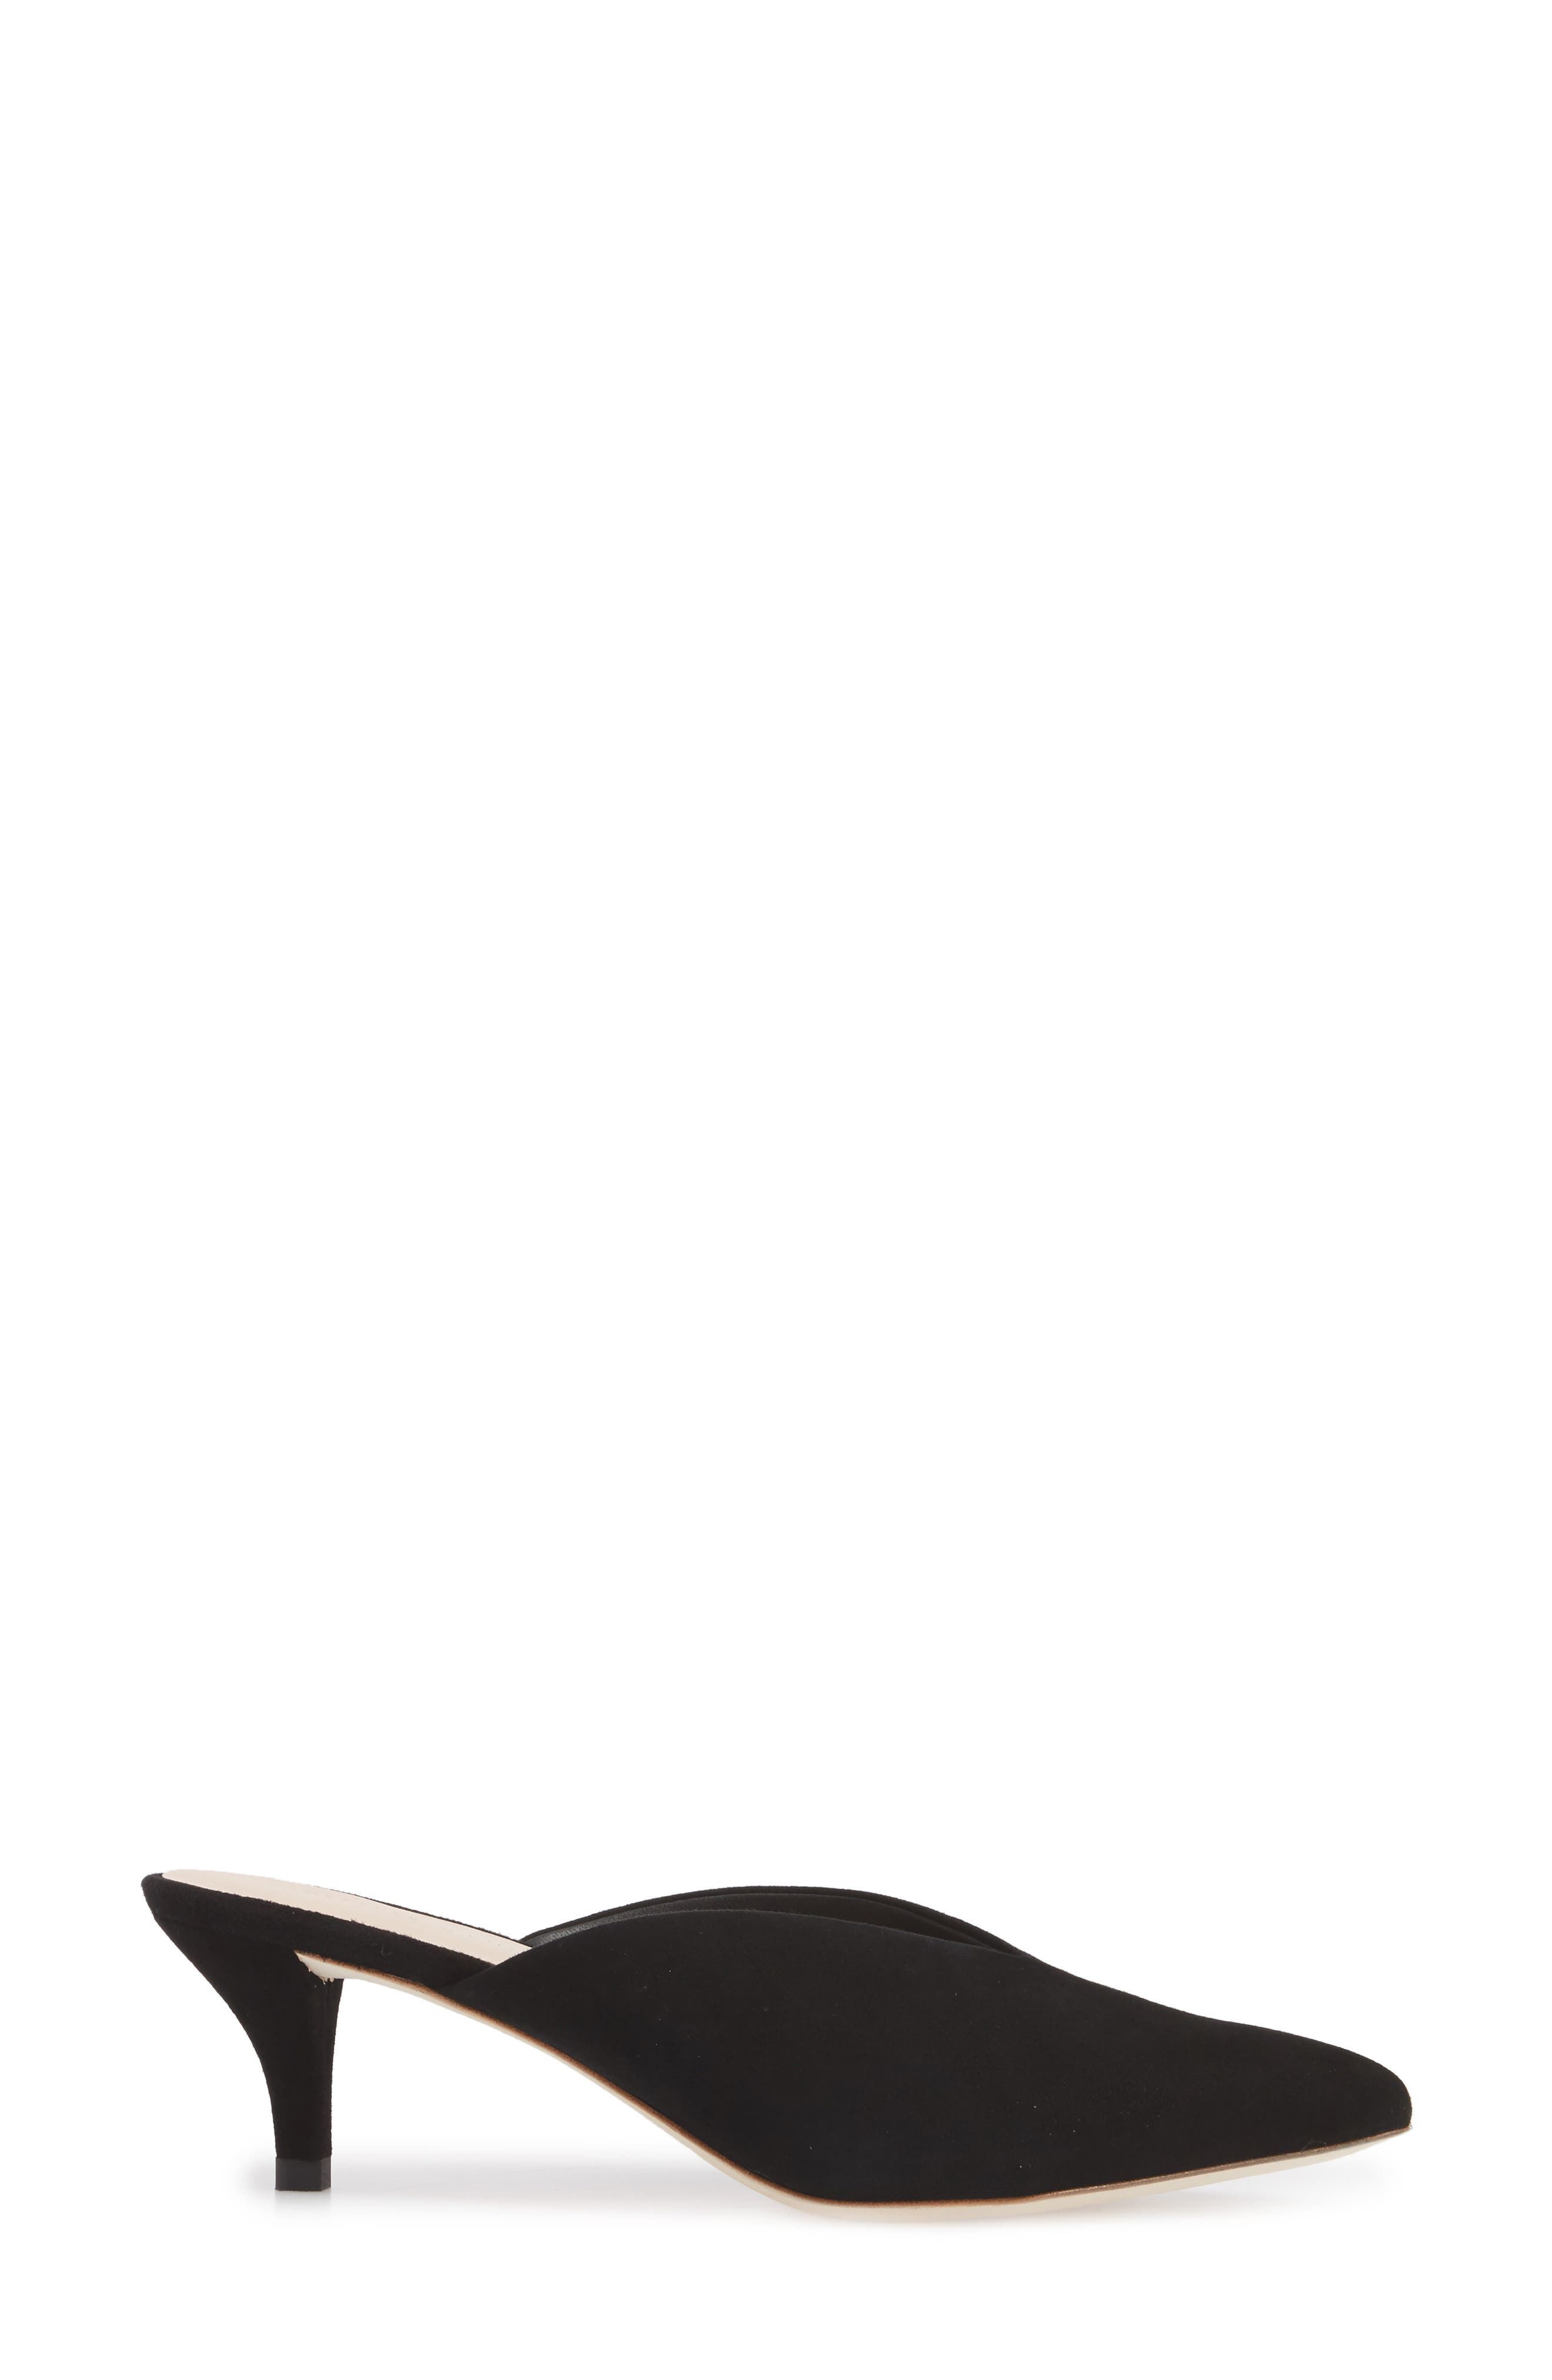 Juno Mule,                             Alternate thumbnail 3, color,                             Black